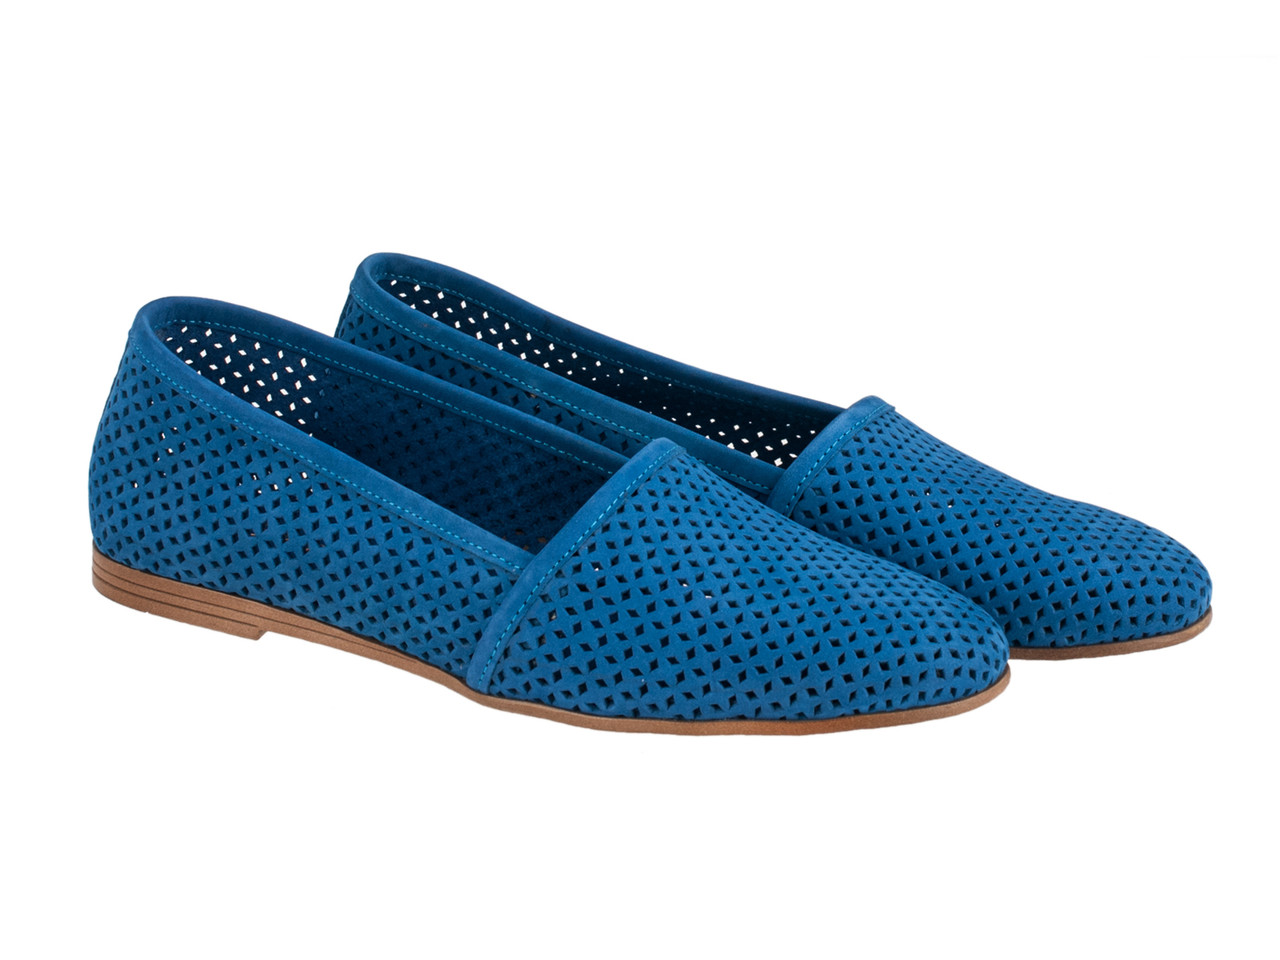 Балетки Etor 6006-7331-718 синие